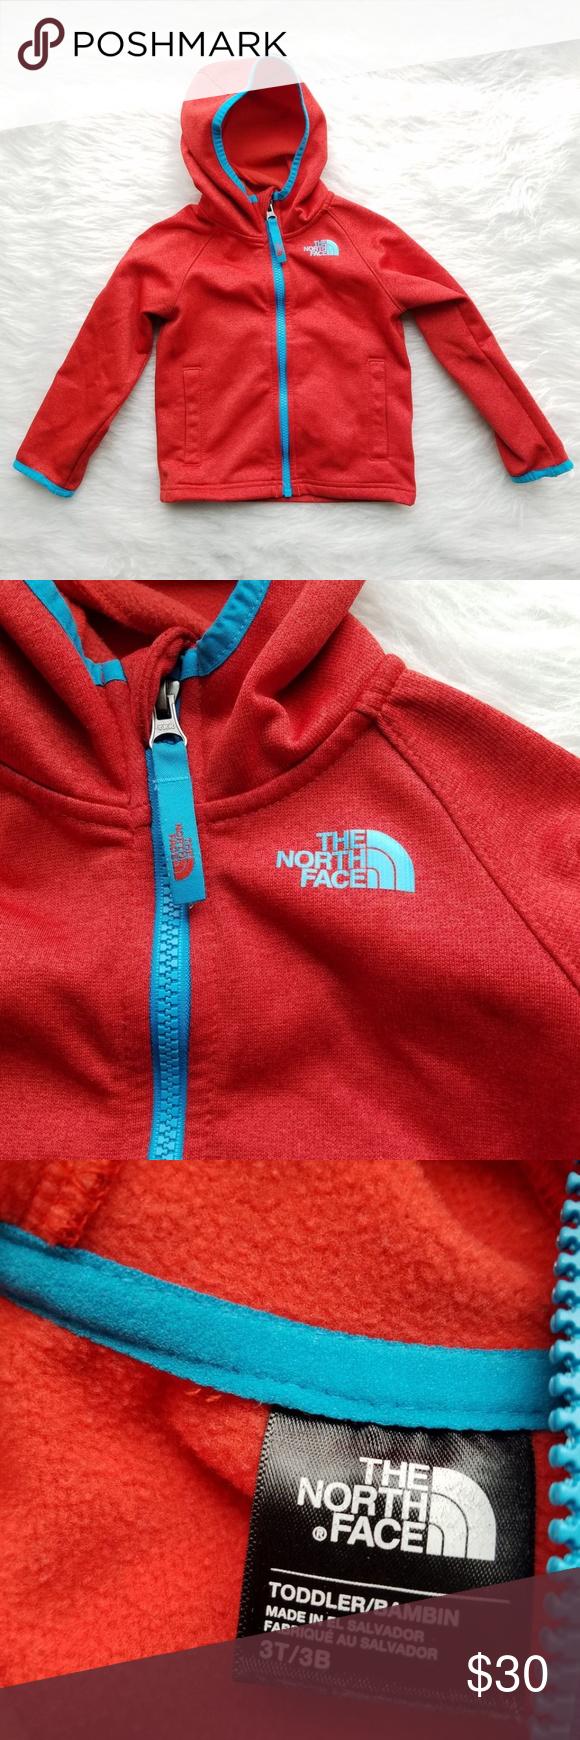 The North Face Kids Hoodie Red Orange Jacket 3t North Face Kids Red Hoodie Orange Jacket [ 1740 x 580 Pixel ]